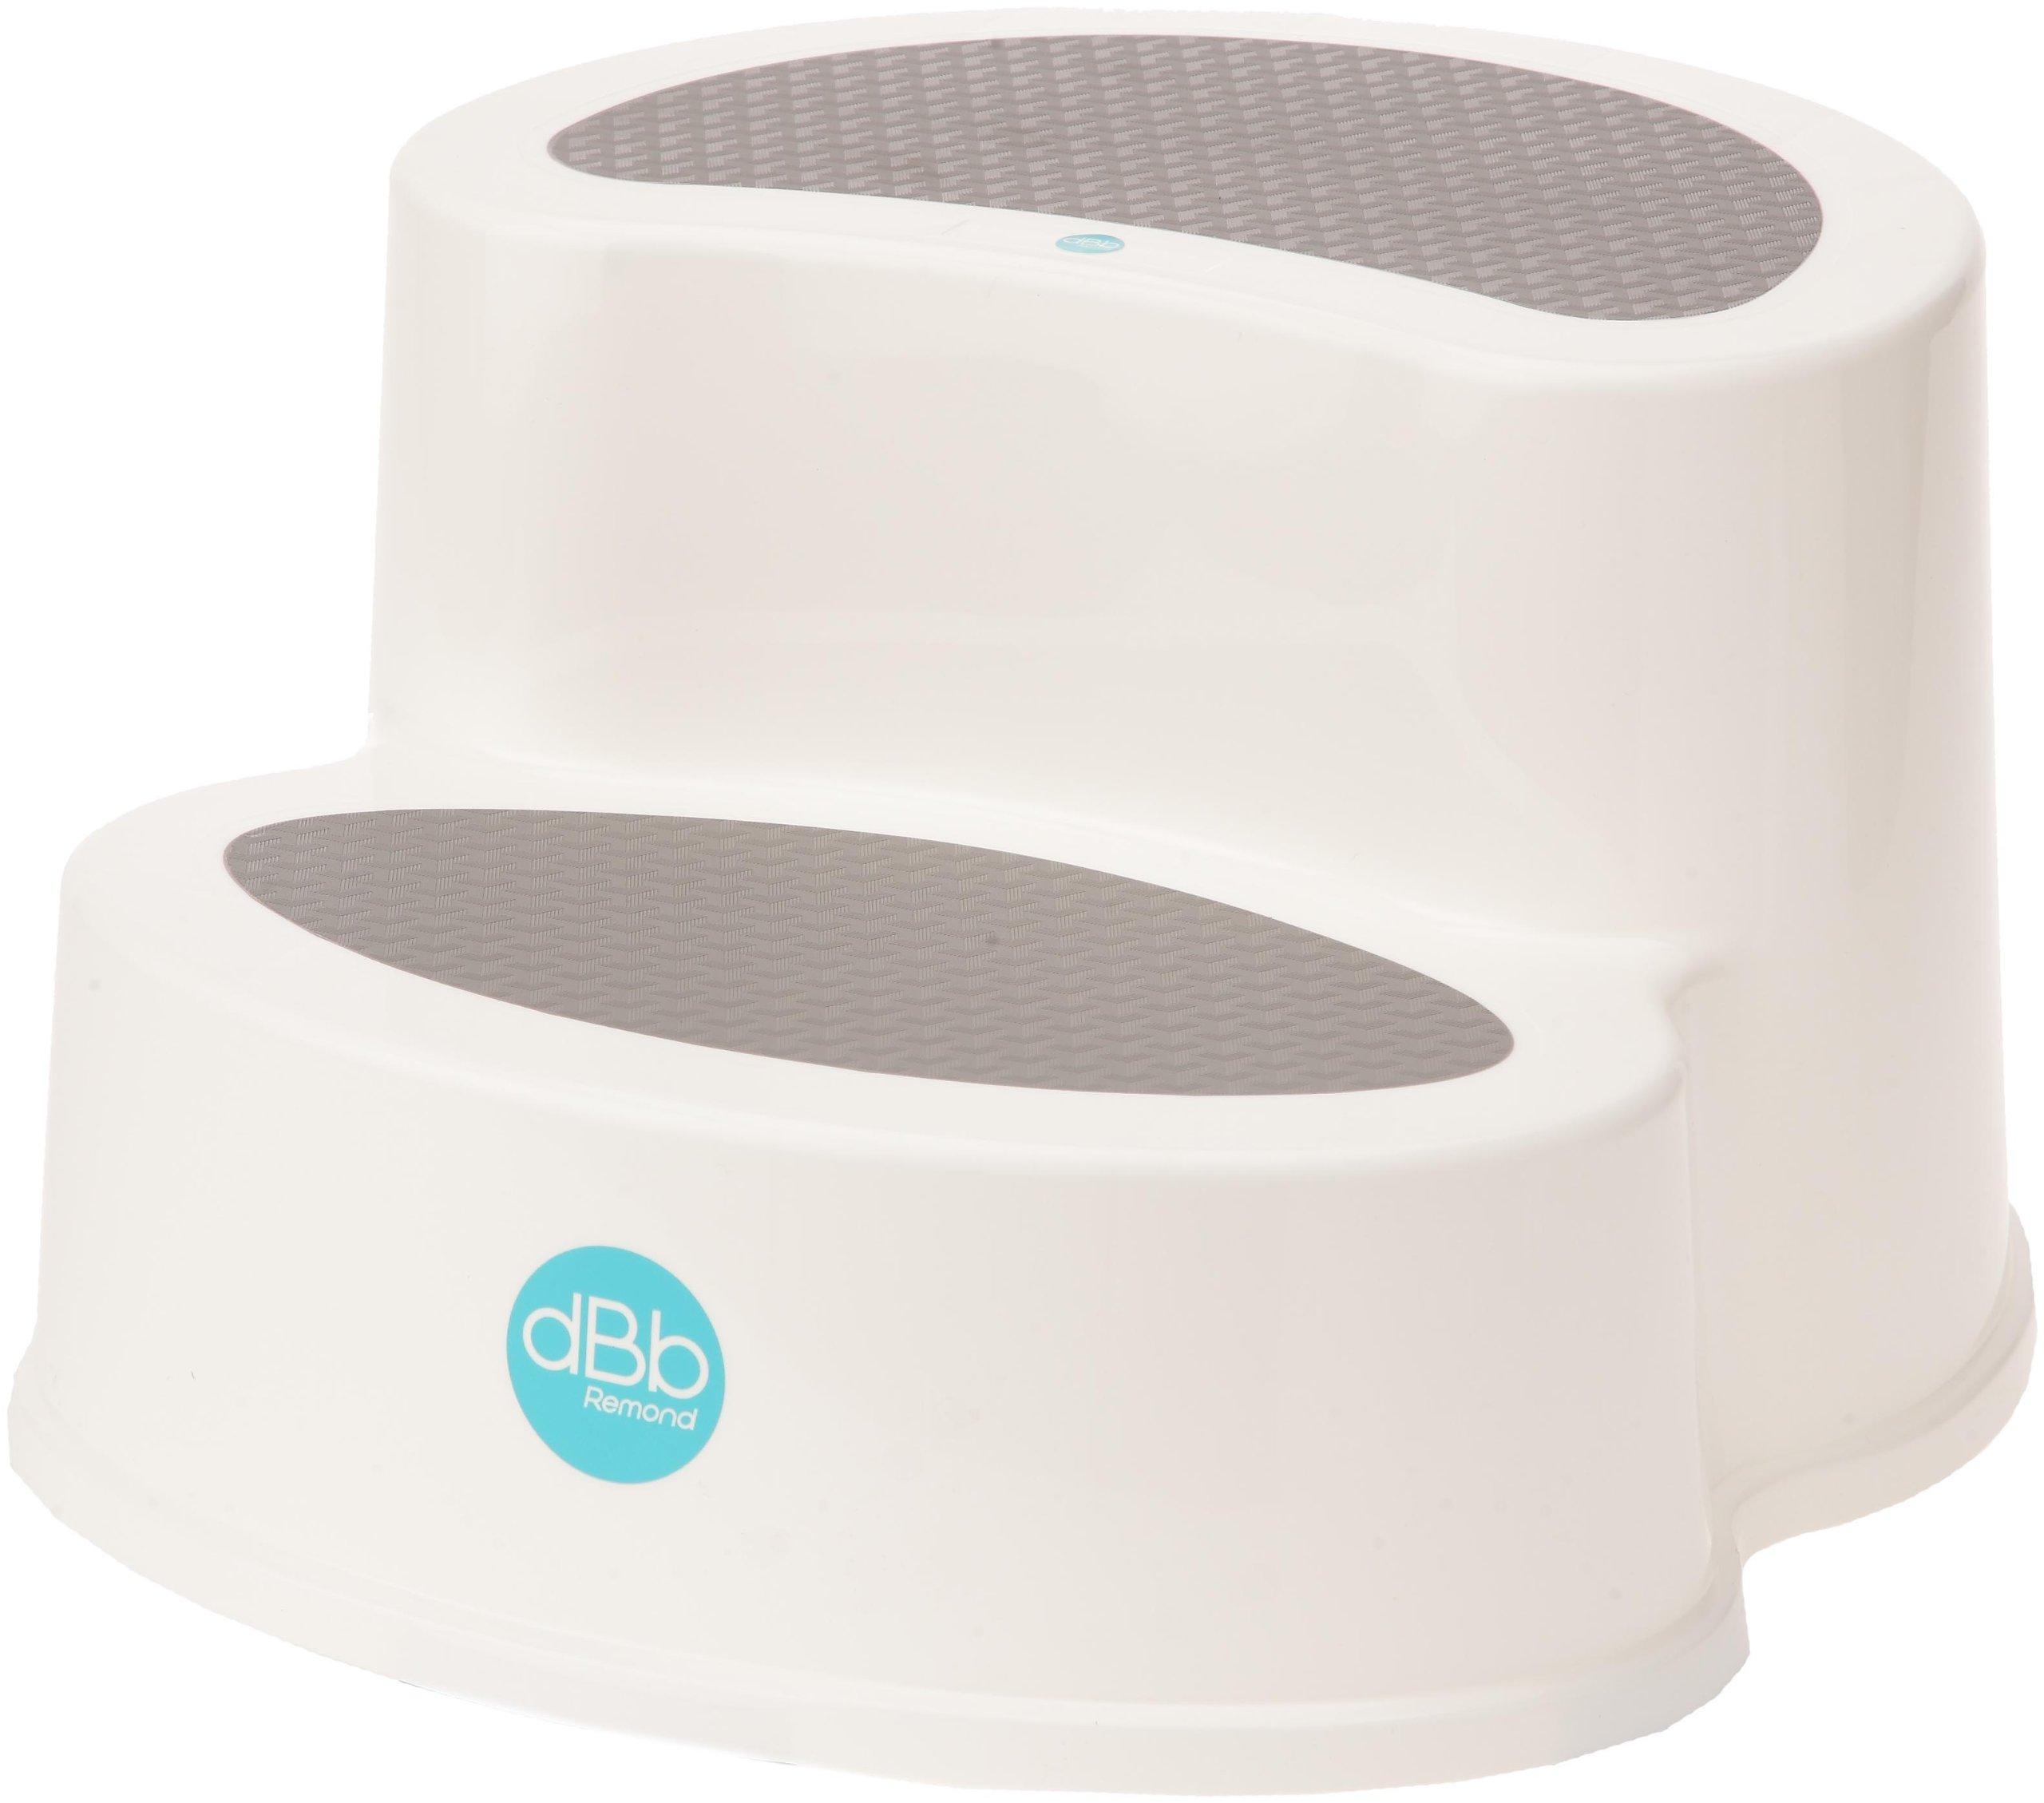 dBb Remond - 307005 - Marche-Pied - Antidérapant - Blanc